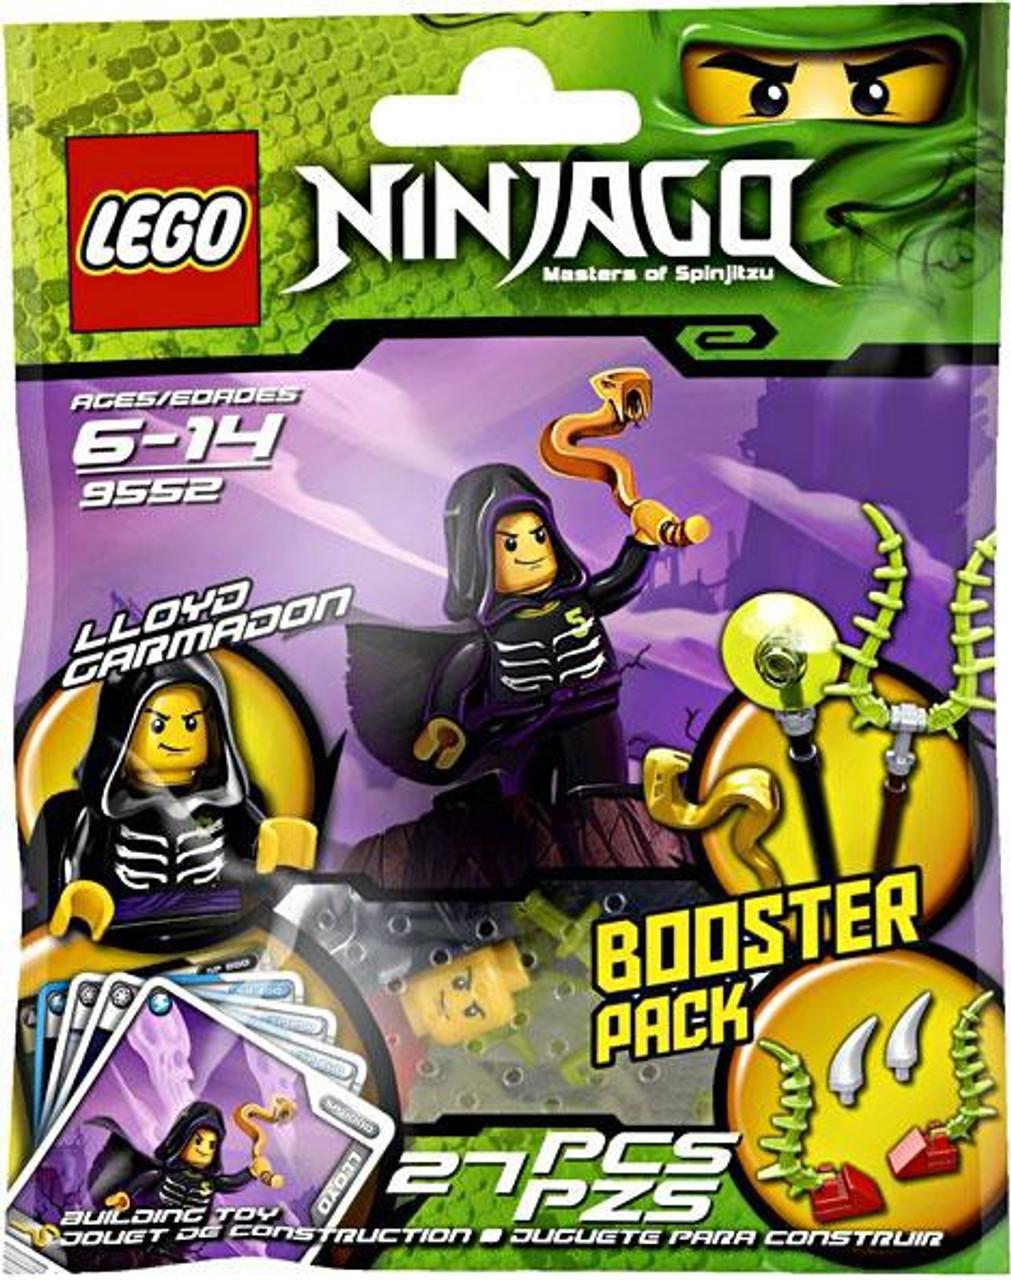 LEGO Ninjago Spinjitzu Spinners Mini Set #9552 [Bagged]